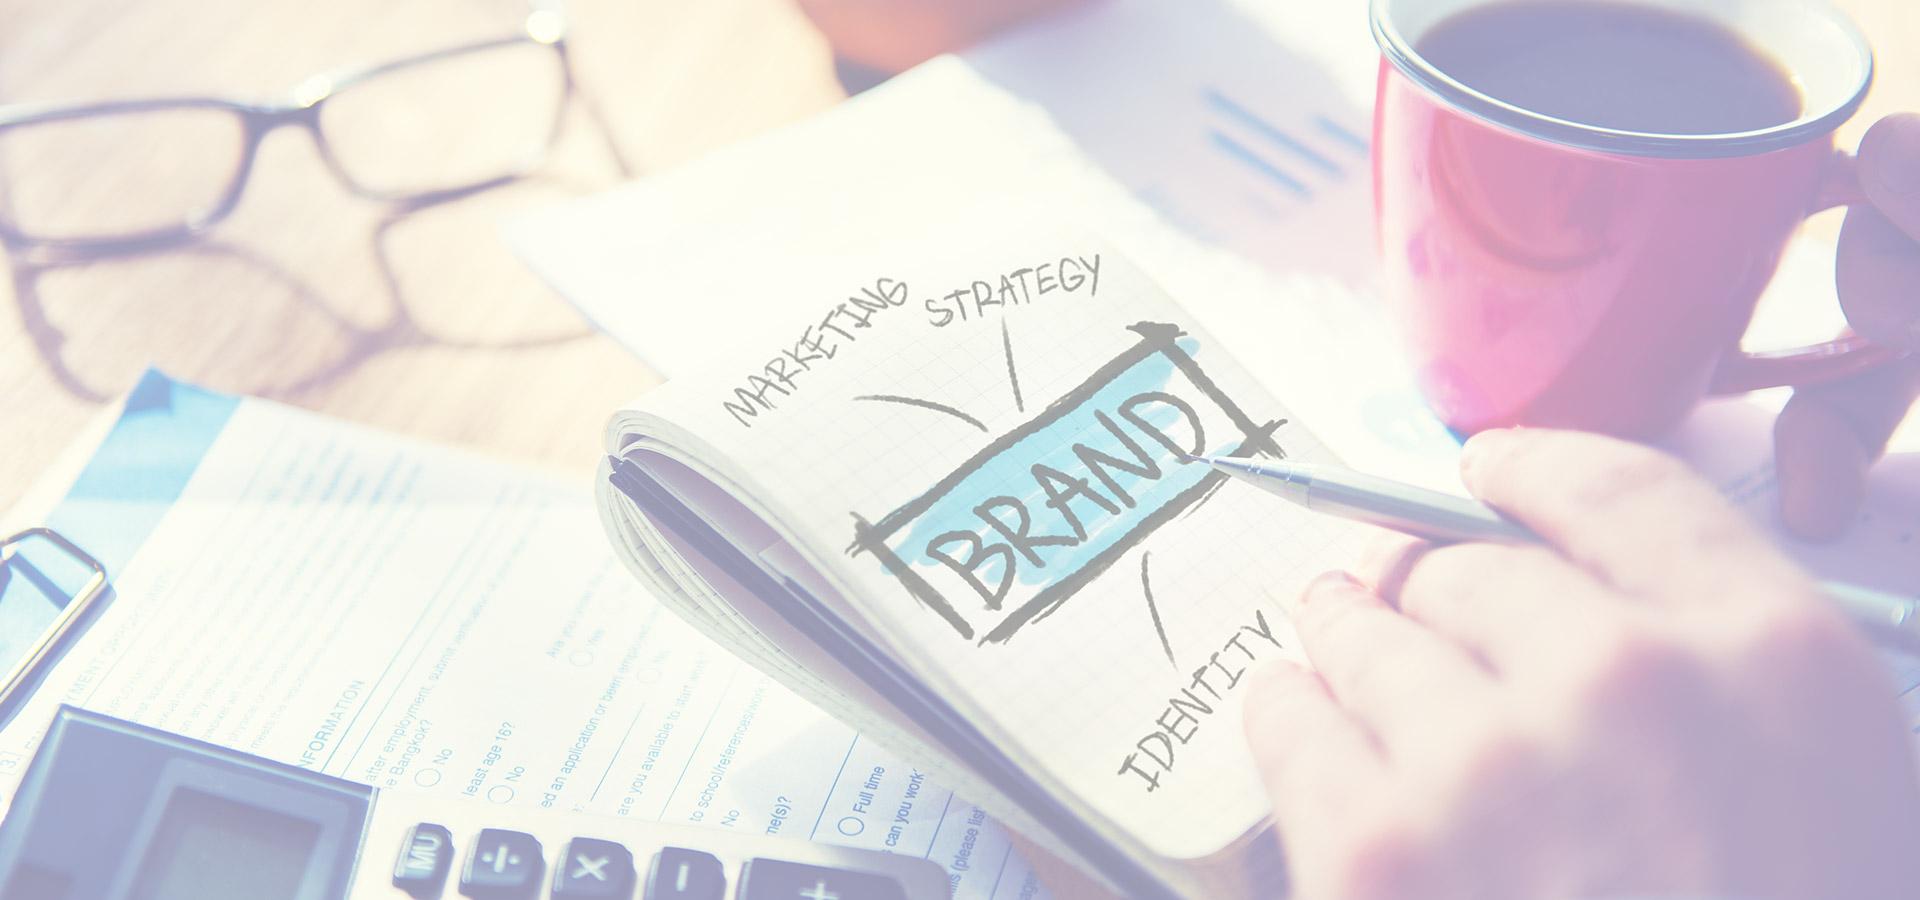 Colorado Springs Online Marketing Digital Marketing Website Design 1920x900